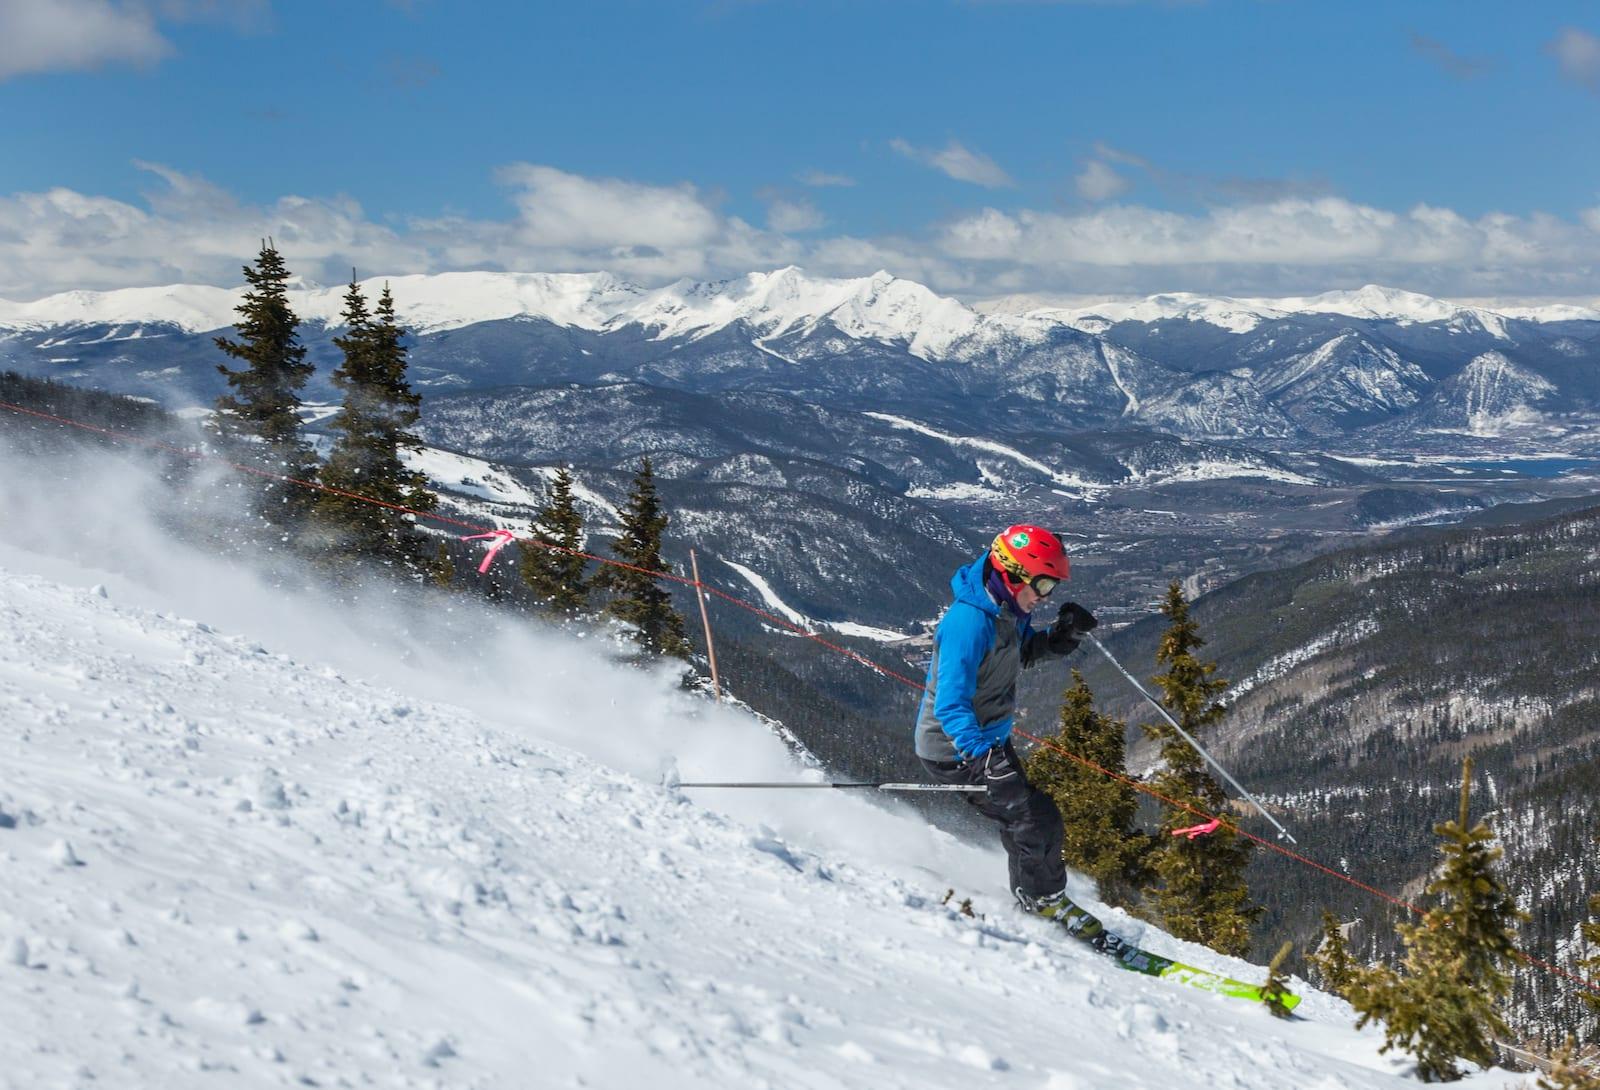 Arapahoe Basin Skier Keystone and Breckenridge Resorts in Background